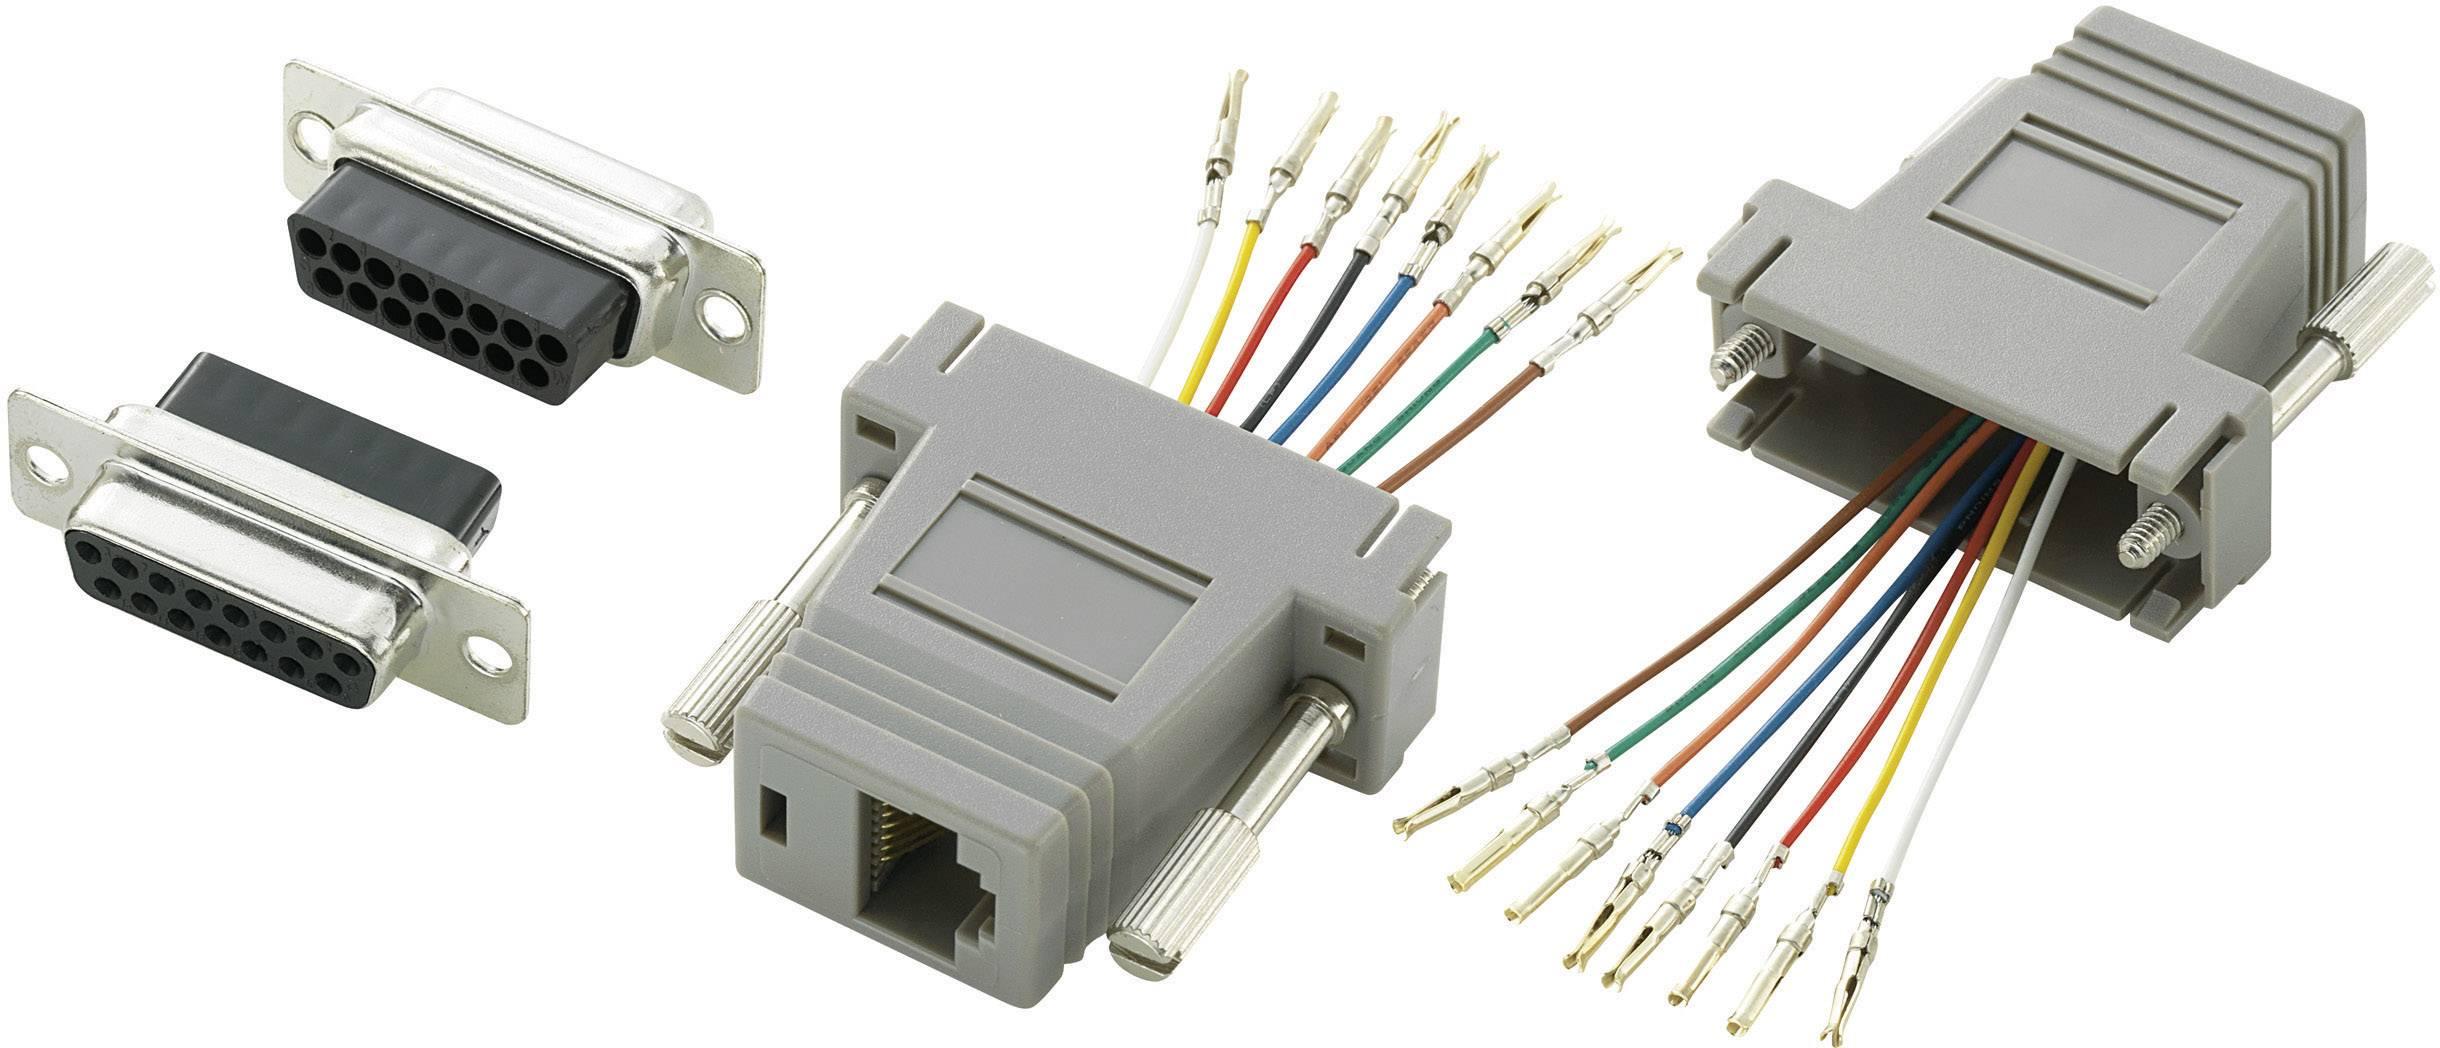 D-SUB adaptér DSub zásuvka 15pólová - RJ45 zásvuka Conrad Components 1 ks